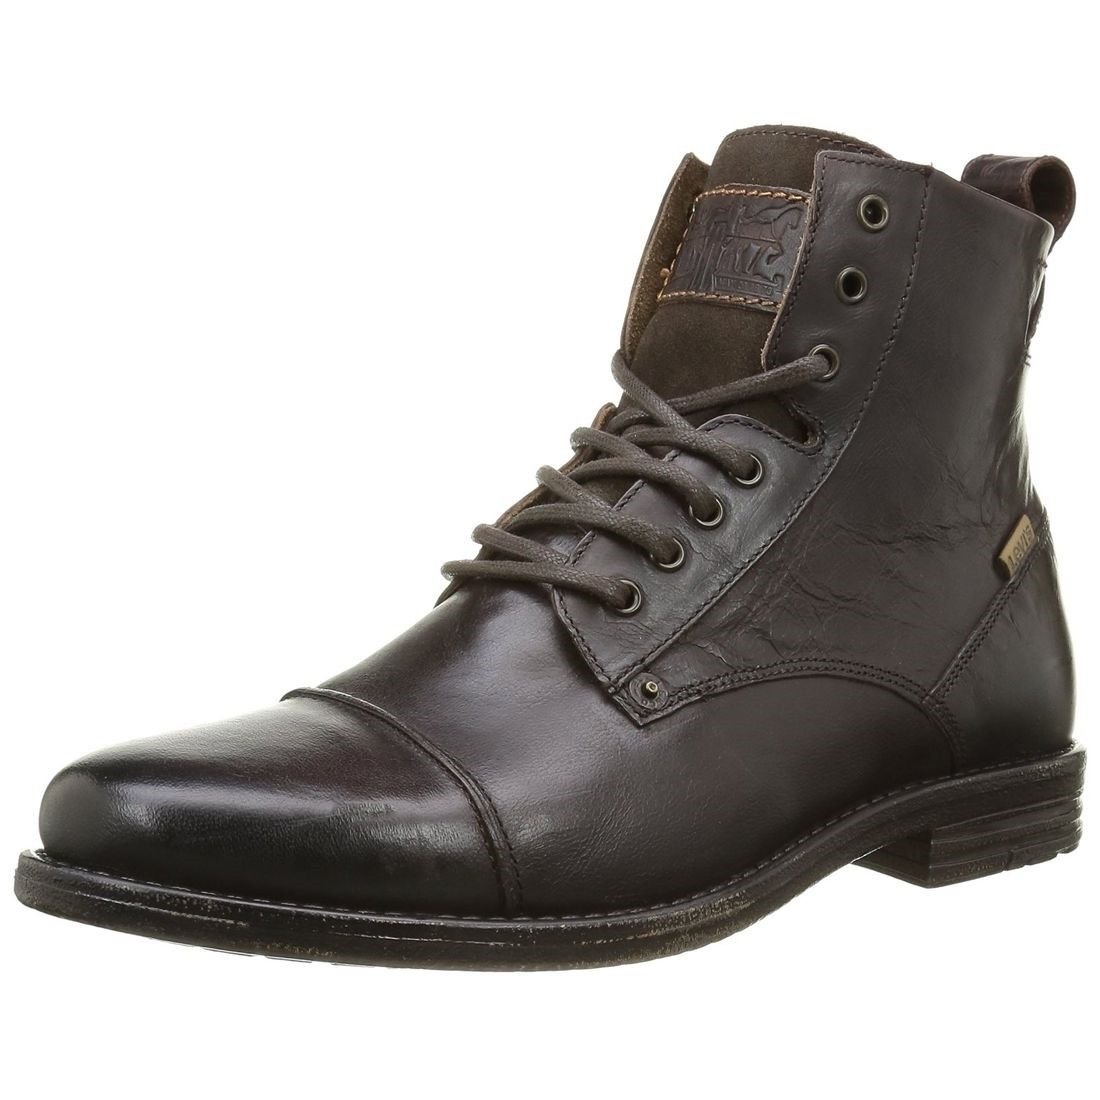 baskets montantes geox u ricky u homme geox f24geox342 | Chaussures homme |  Pinterest | Chaussures hommes, Hommes et Chaussure